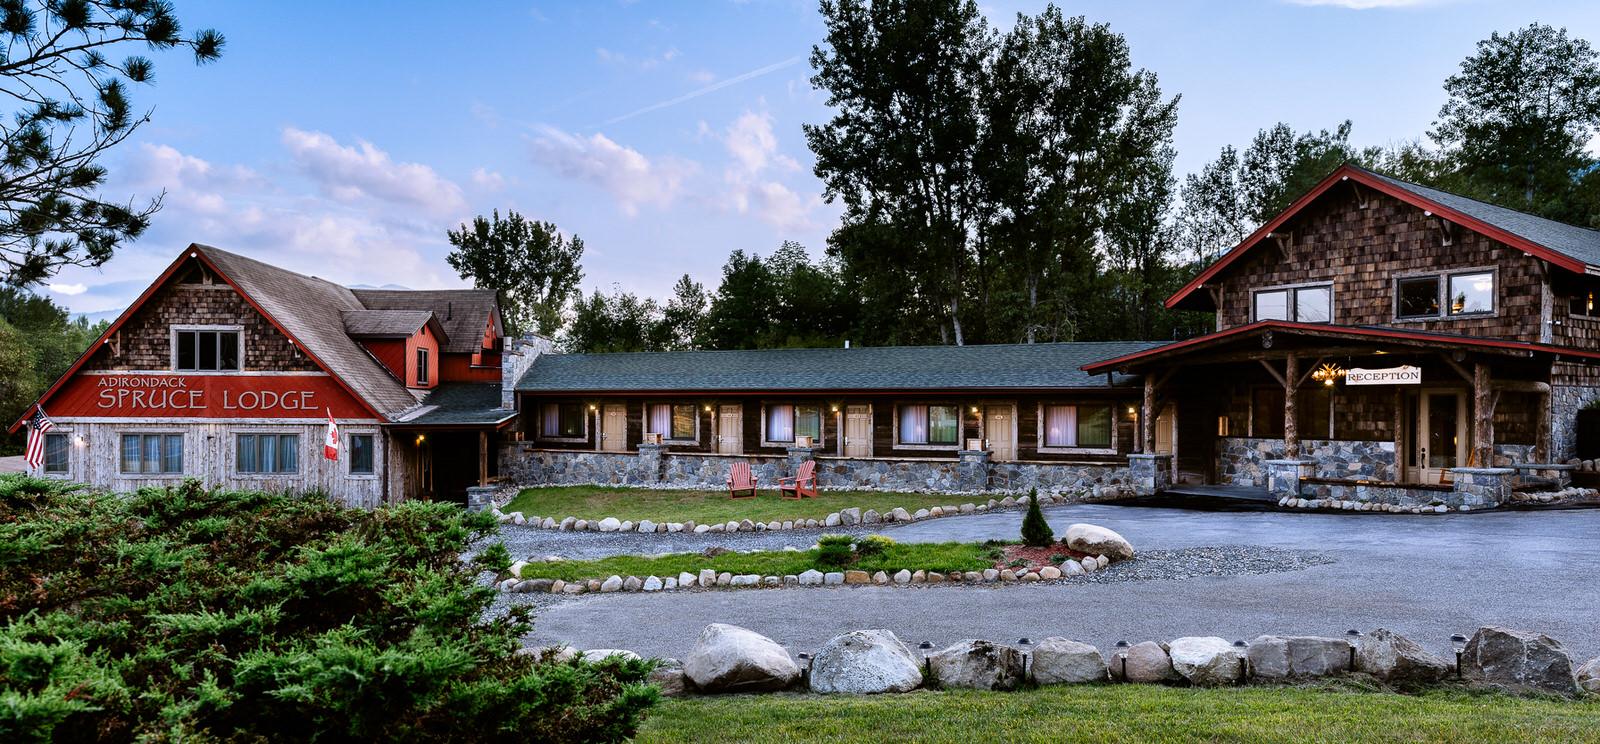 Adk-Spruce-Lodge-2048px-57.jpg